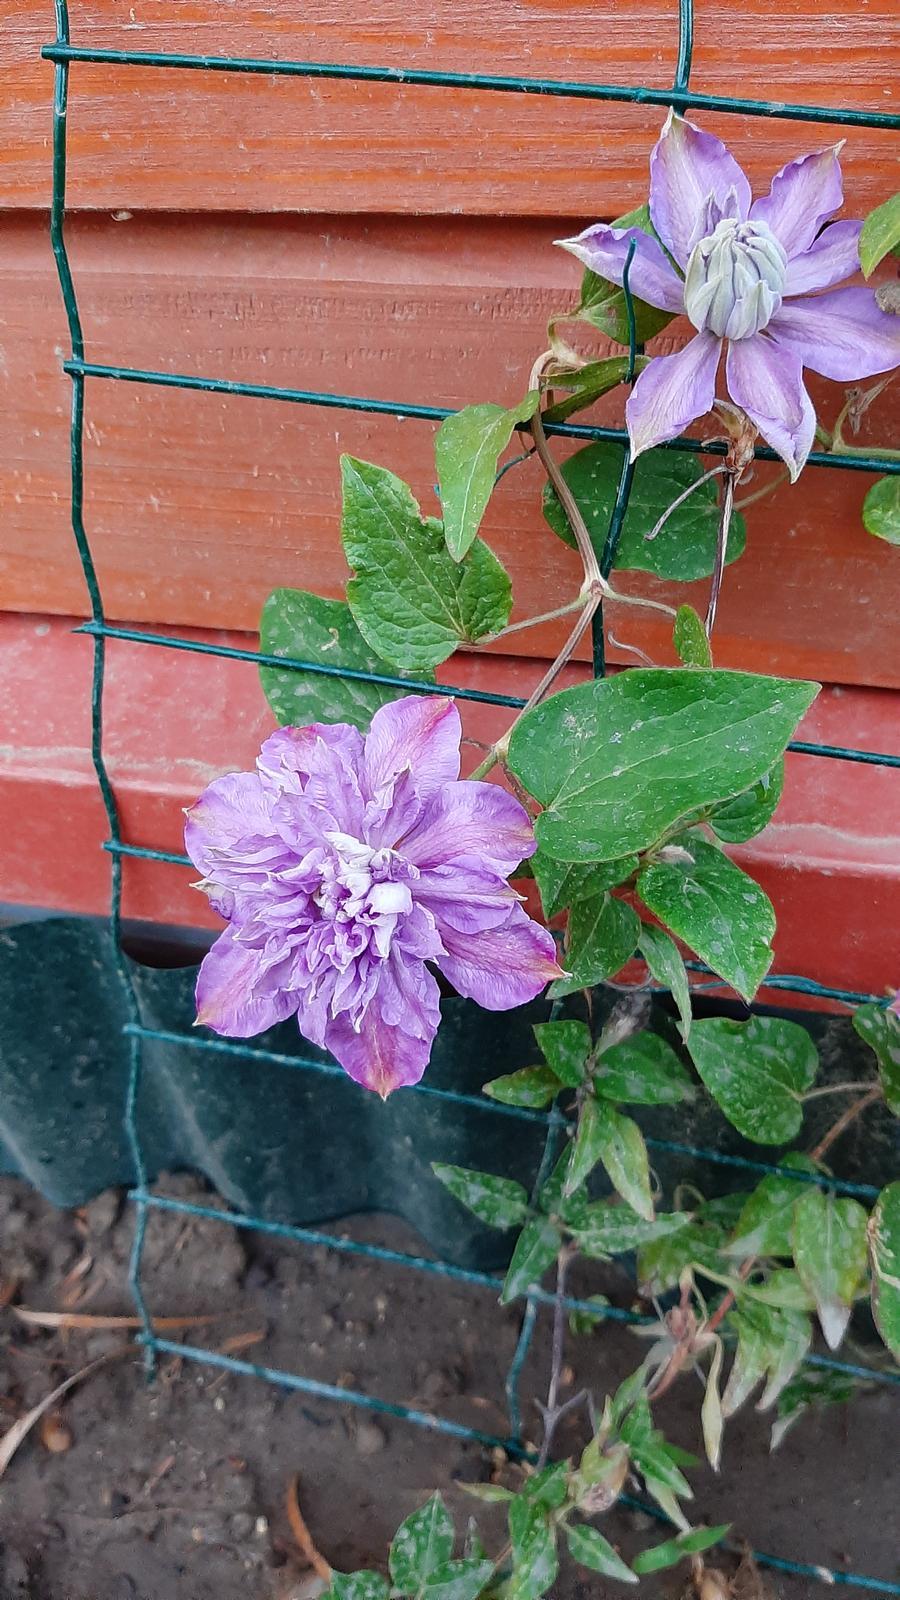 🏠🌞🌺❤🌷 Zahrada a jej dalsi rok...2020 🌱🐞🐛🦋🍓🥕🍅🌺❤ - Plamienok ledva prezil zimu...ale zakvitol.